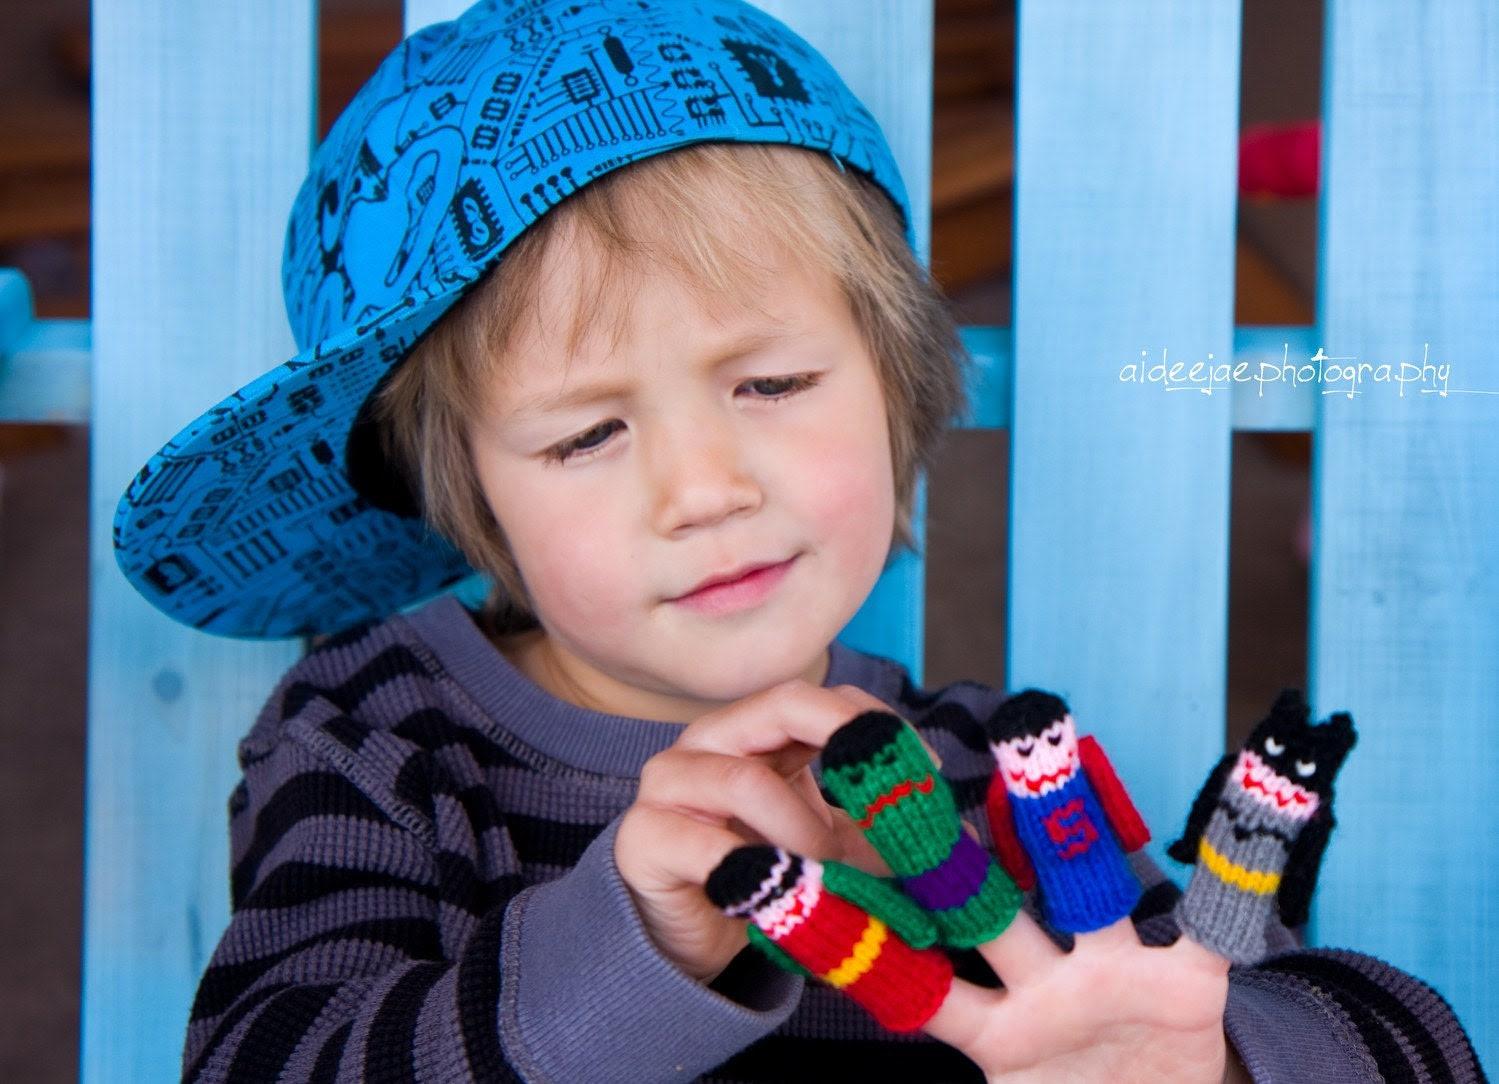 WeeKnit's Finger Puppet Sets